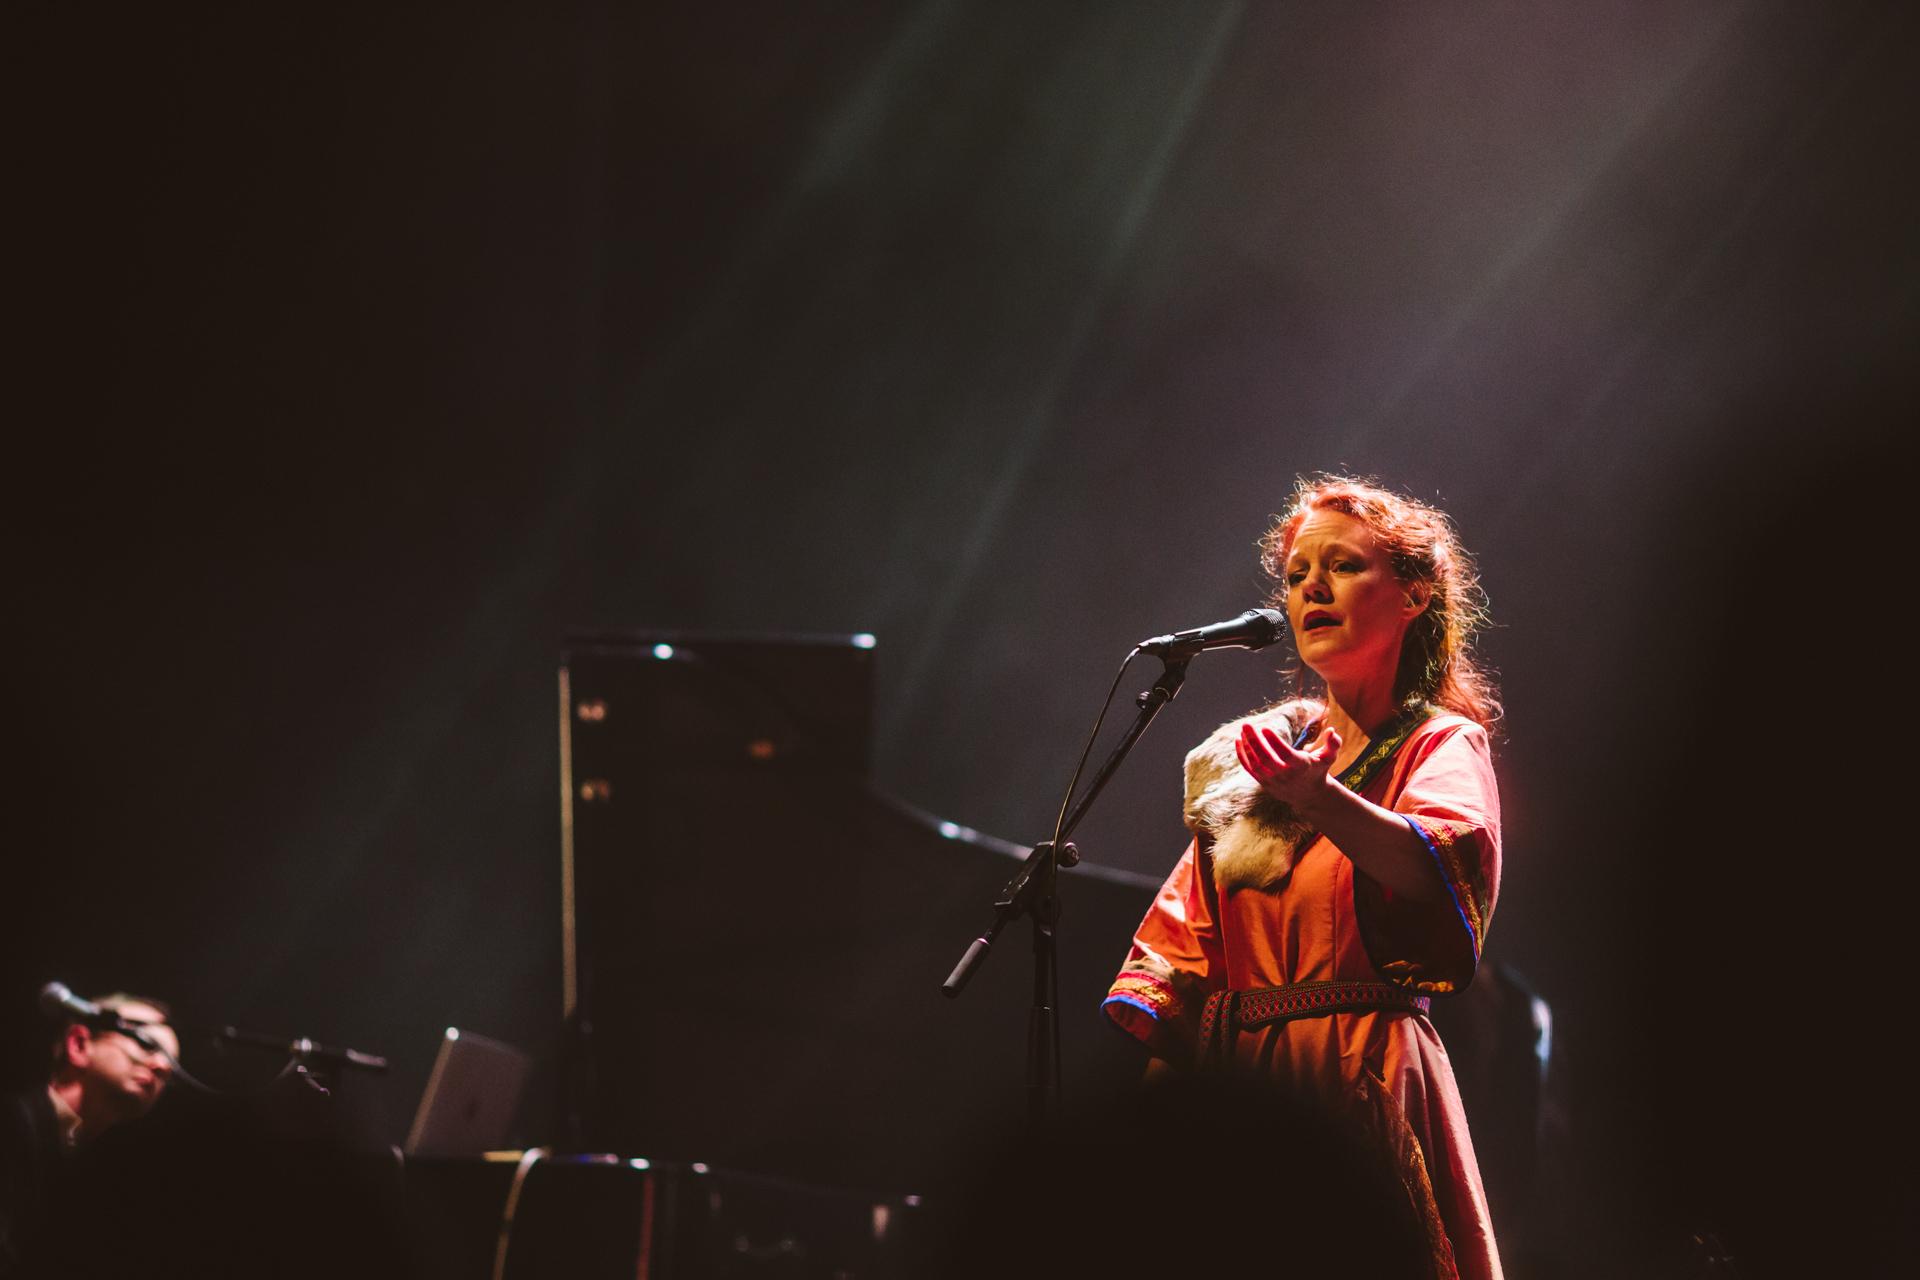 WEB-Elin-Teilus-concert-fotograf-Zita Marias-047.jpeg